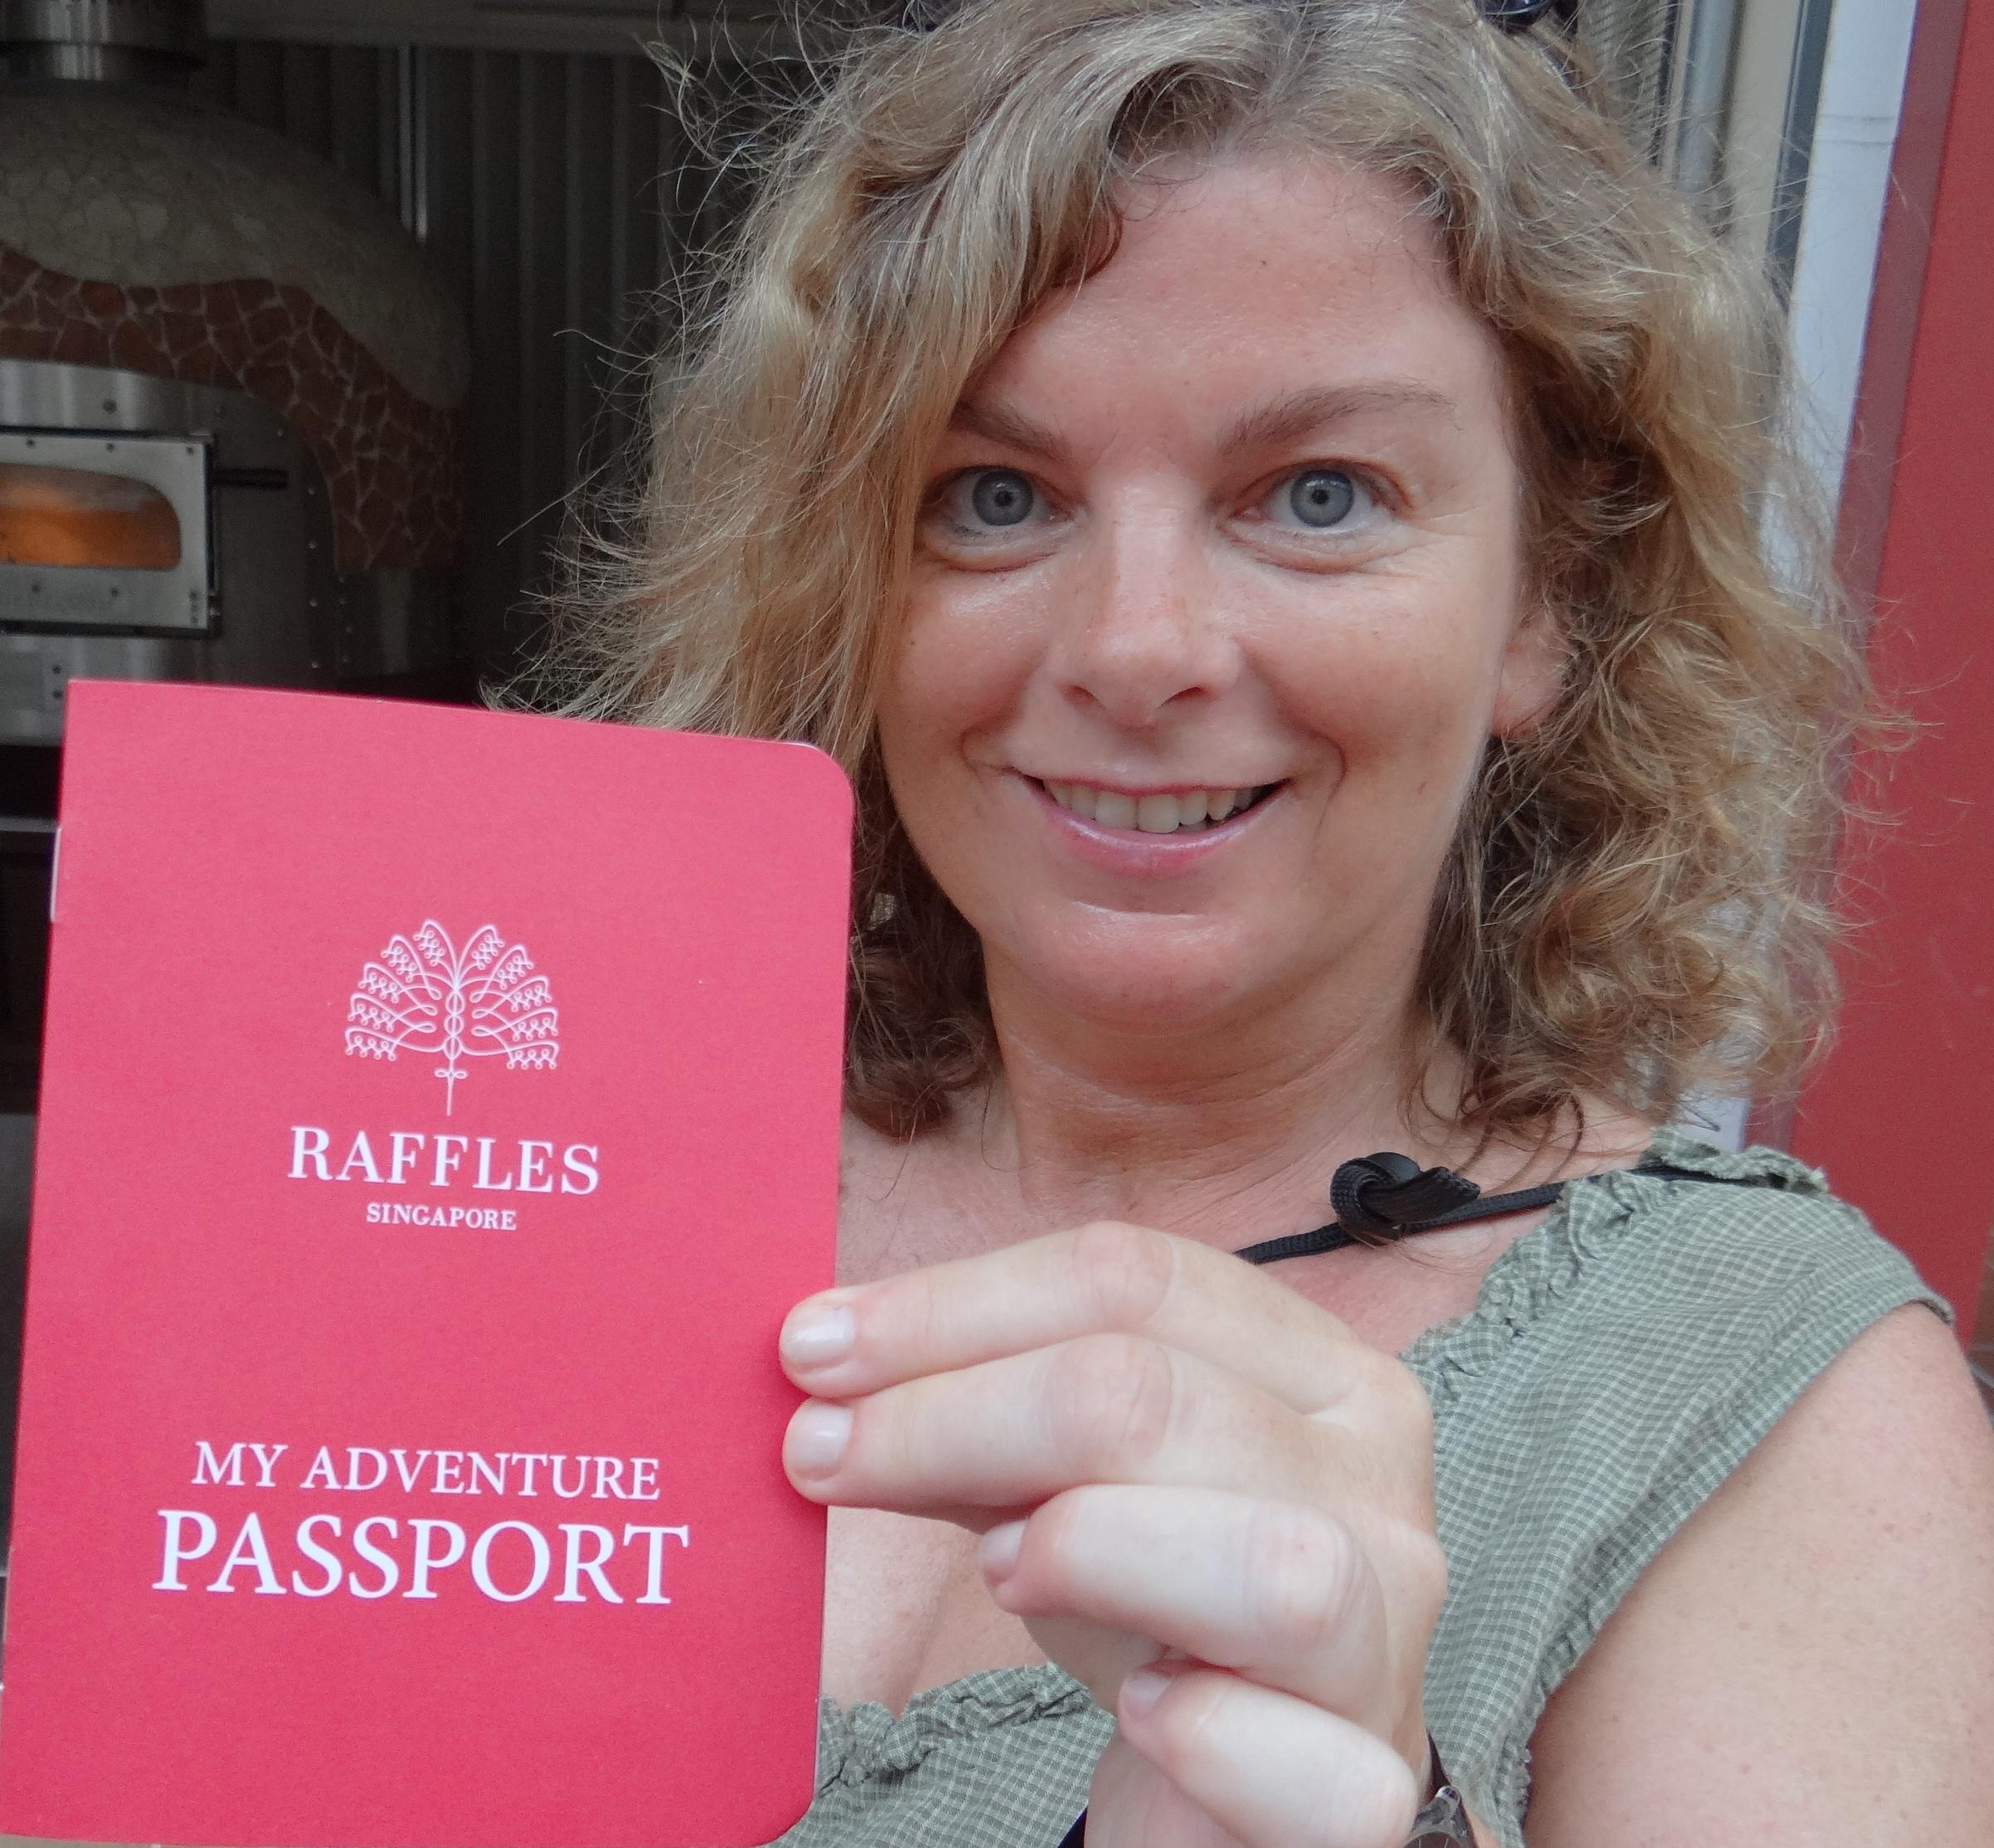 My Adventure Passport